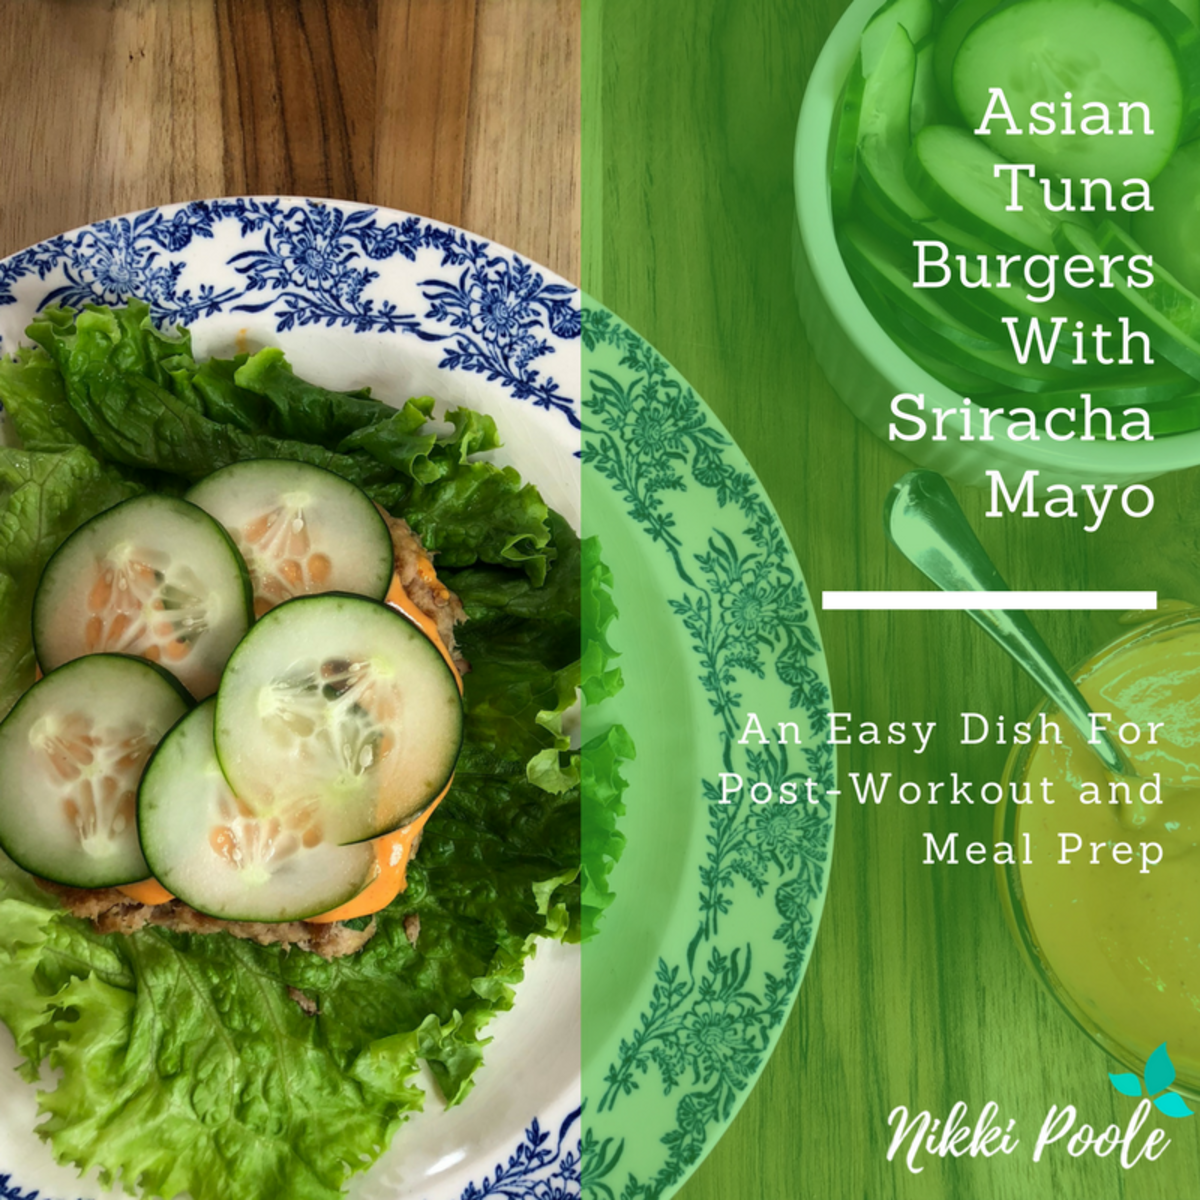 Low-Carb Asian Tuna Burgers With Sriracha Mayo